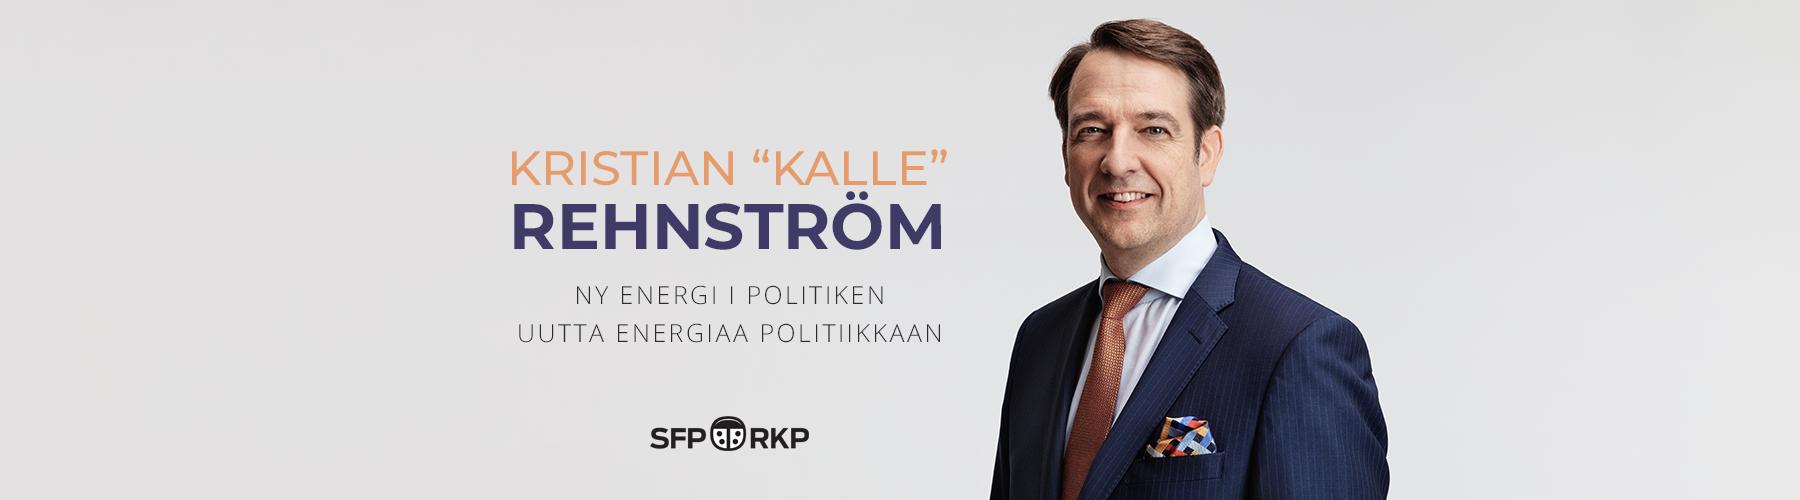 "Kristian ""Kalle"" Rehnström"